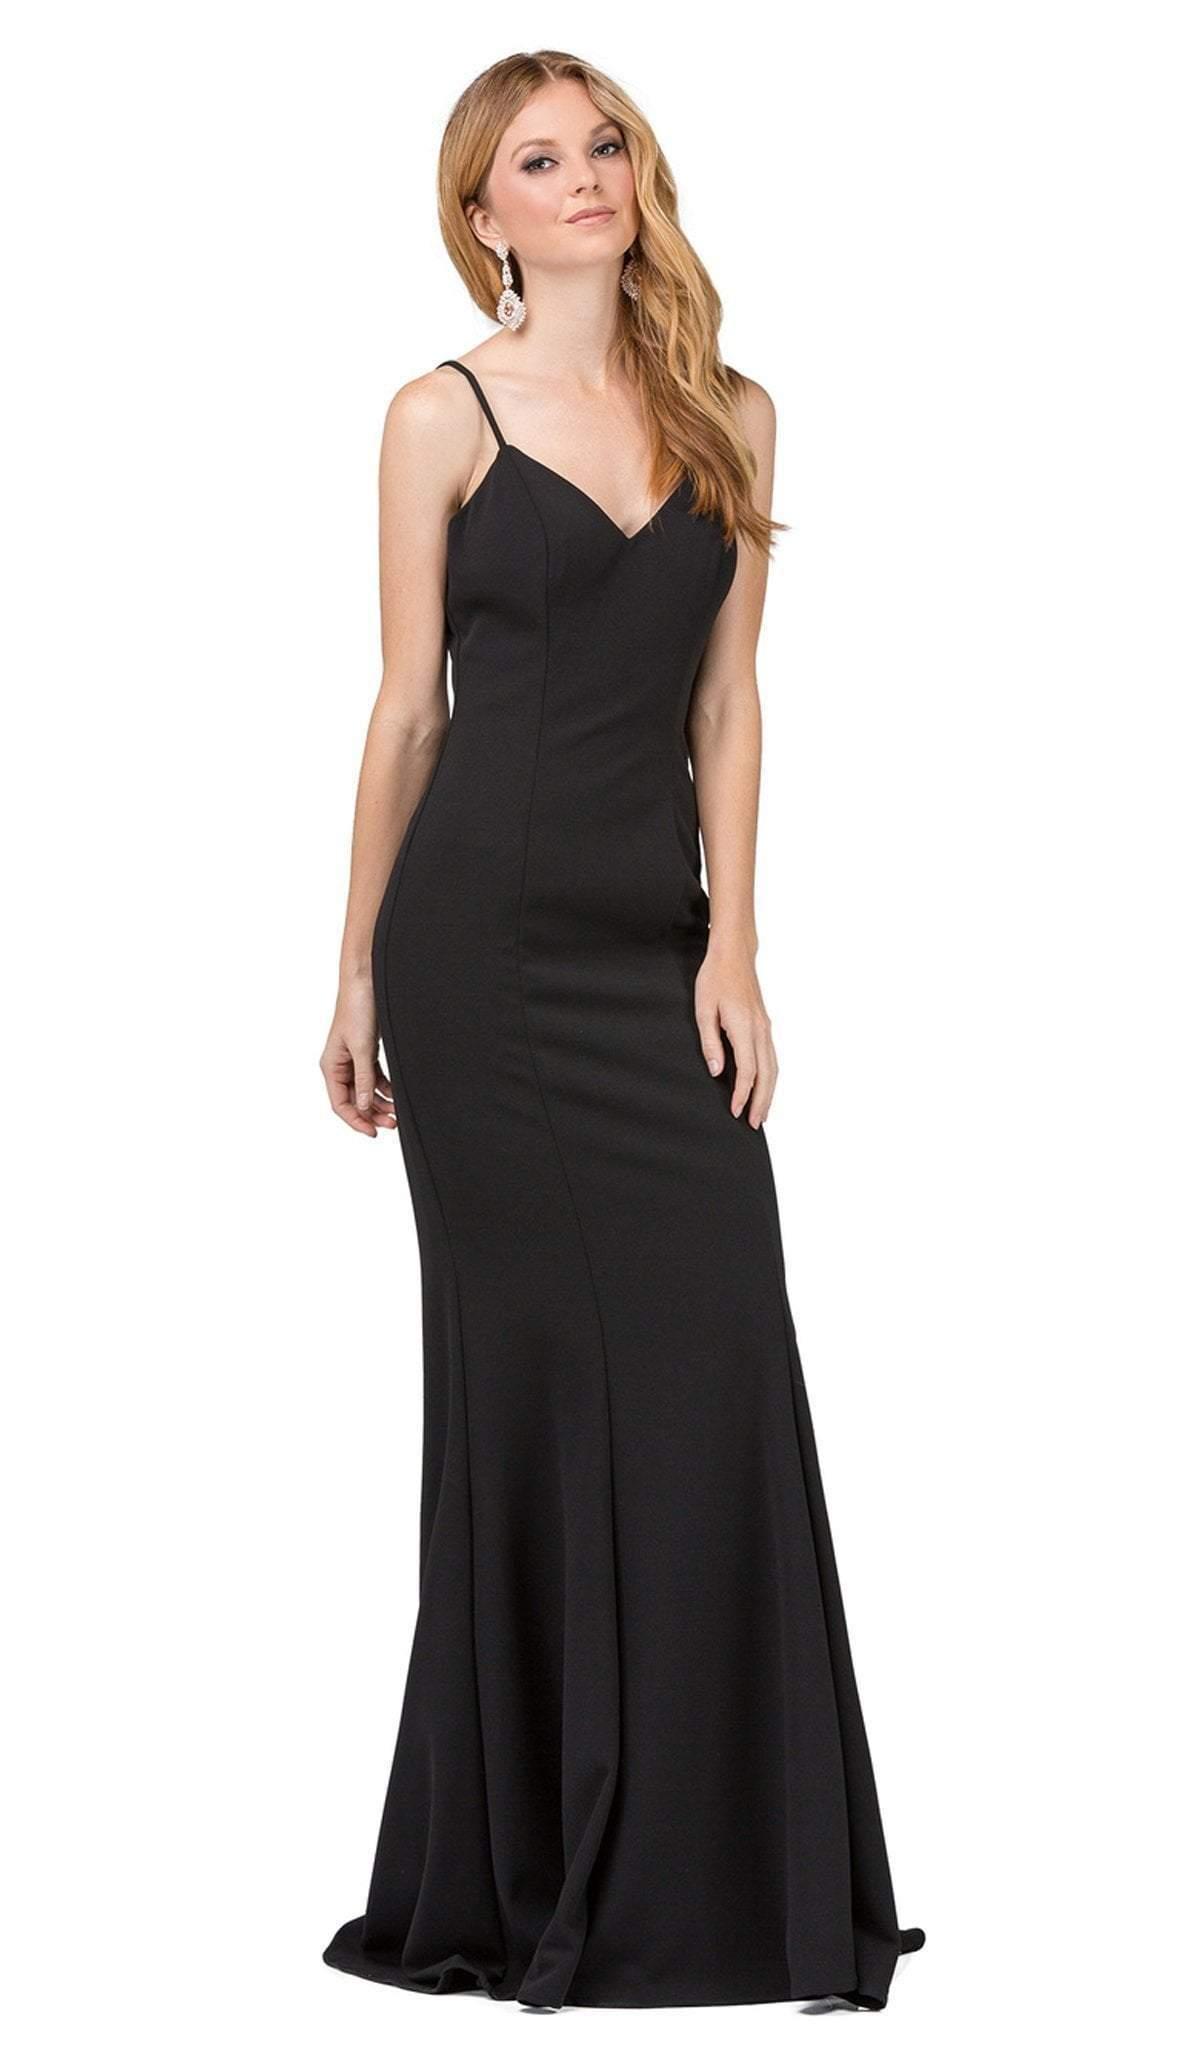 Dancing Queen - 2264 Sleeveless Sleek V-neck Sheath Prom Dress